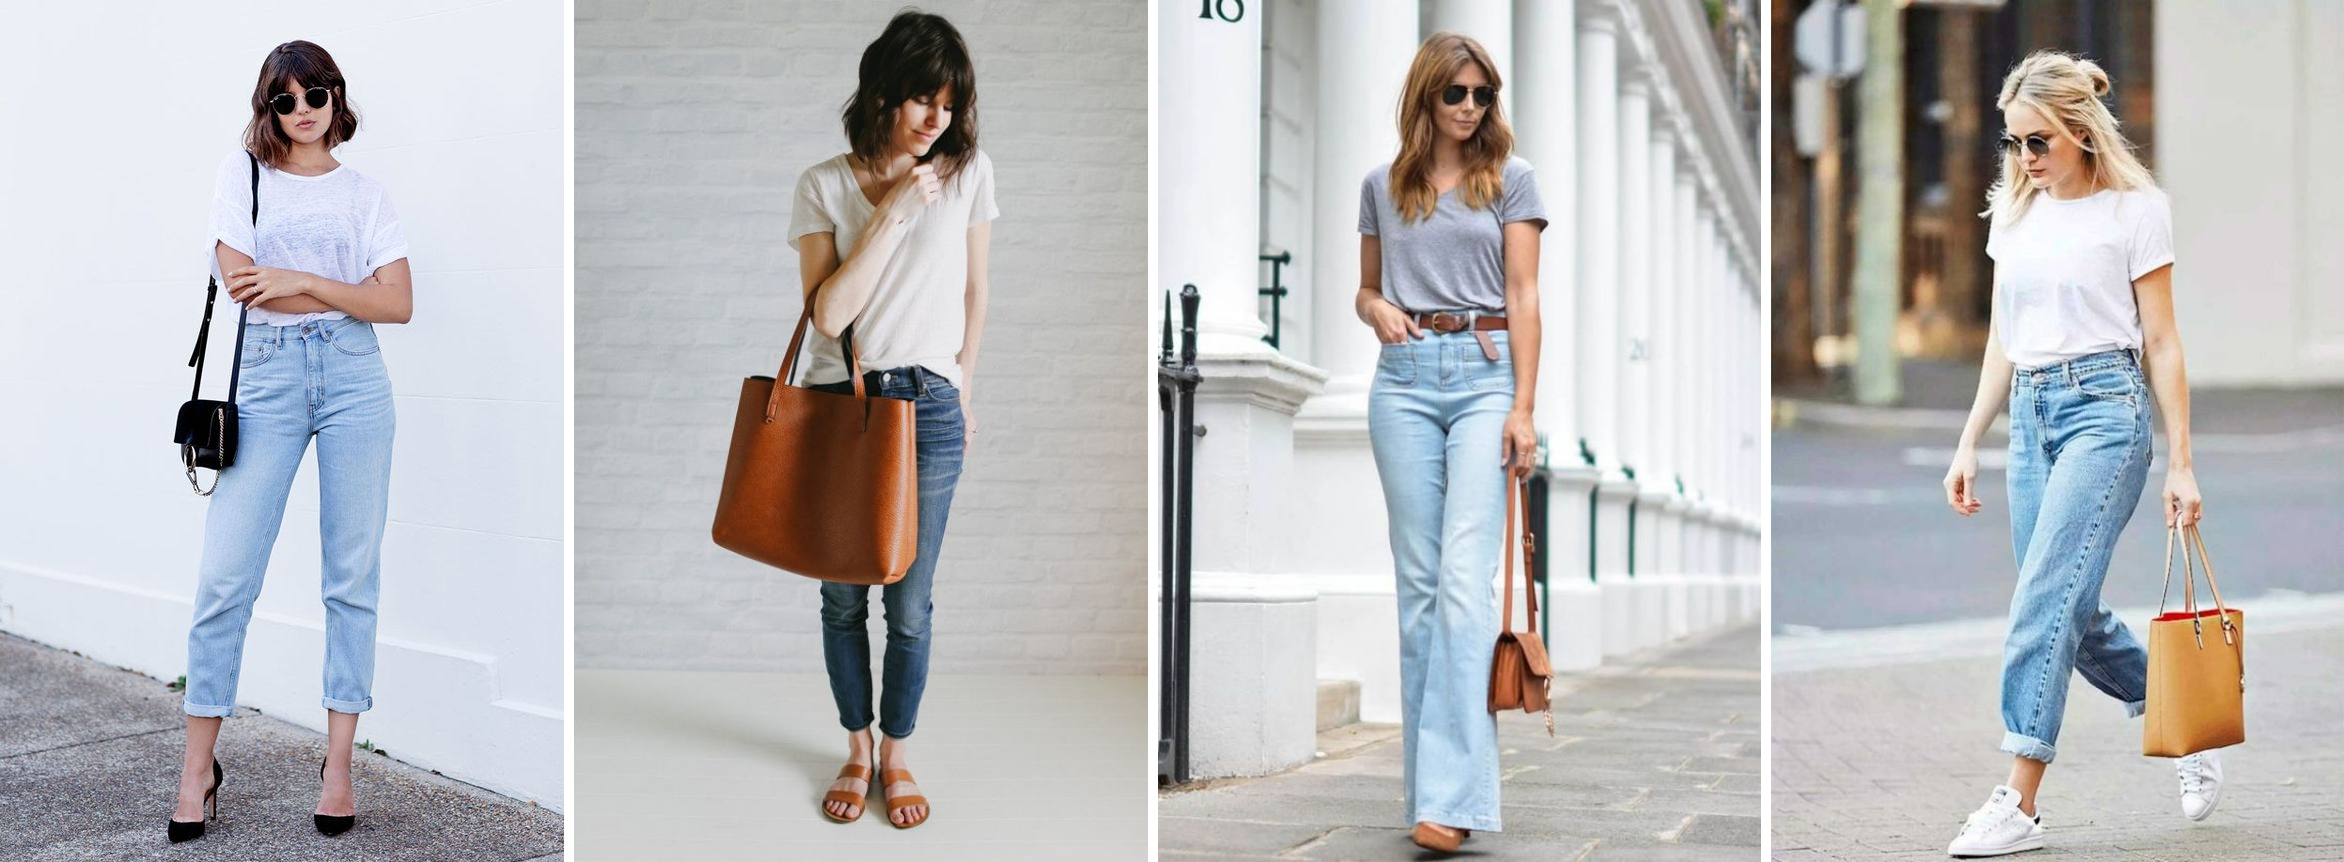 como se vestir no estilo basico jeans e camiseta